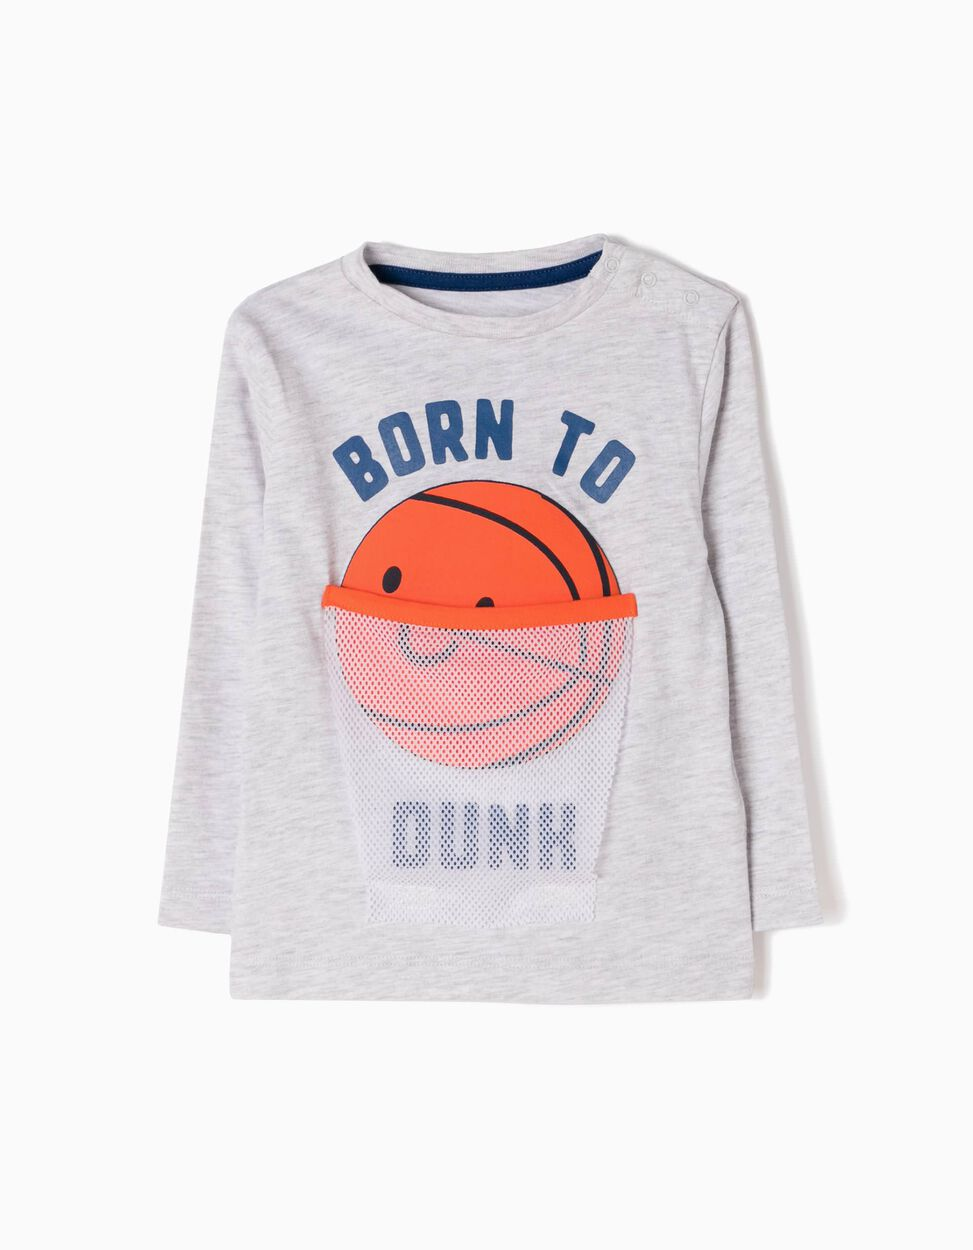 T-shirt Manga Comprida Estampada Born To Dunk